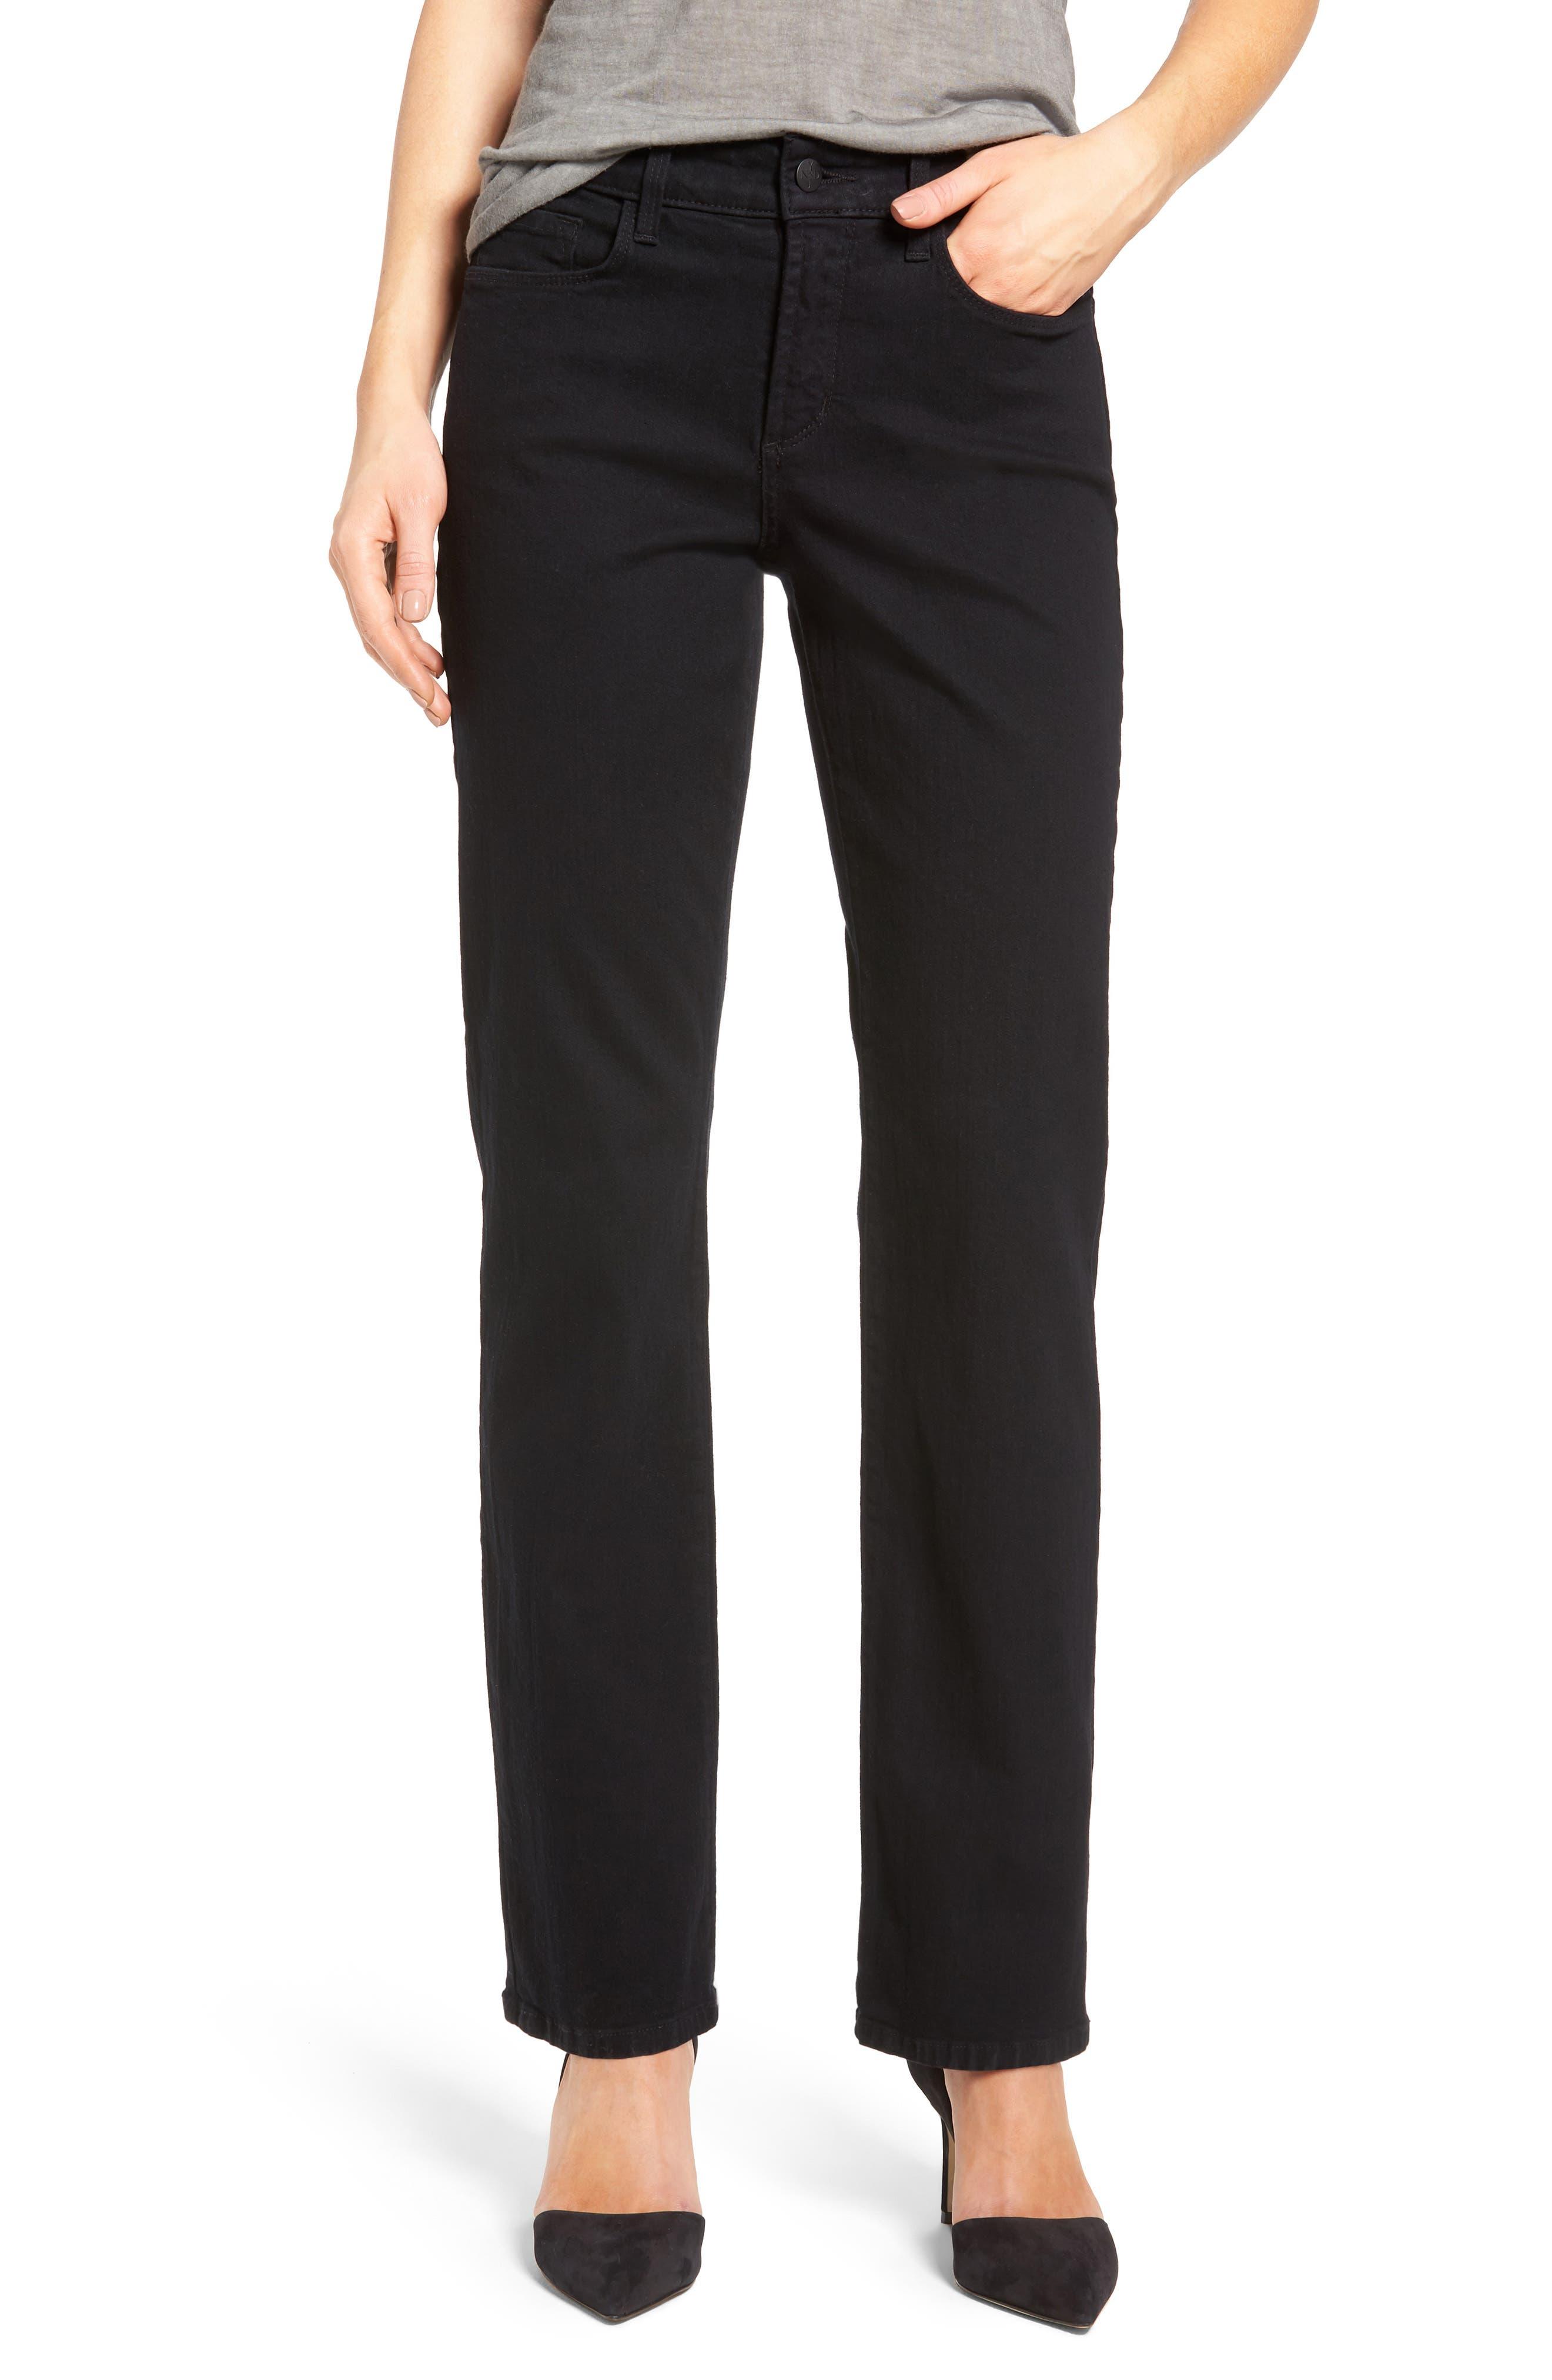 NYDJ Marilyn High Waist Stretch Straight Leg Jeans, Main, color, BLACK